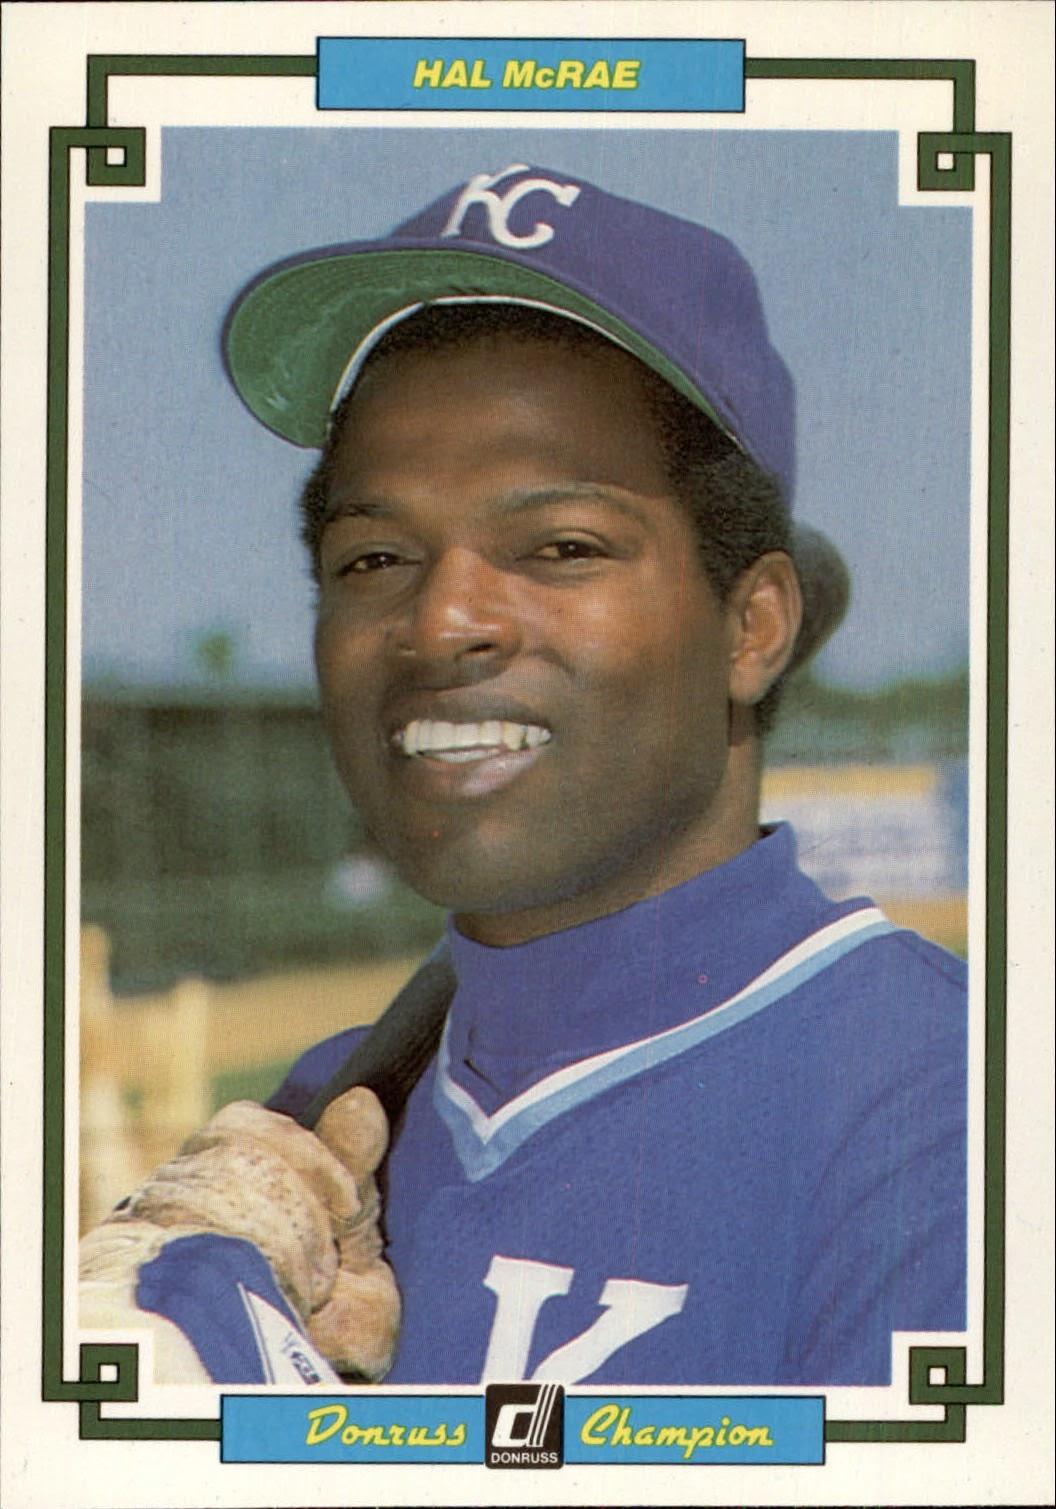 Baseball Card Pack A Day 1984 Donruss Baseball Champions